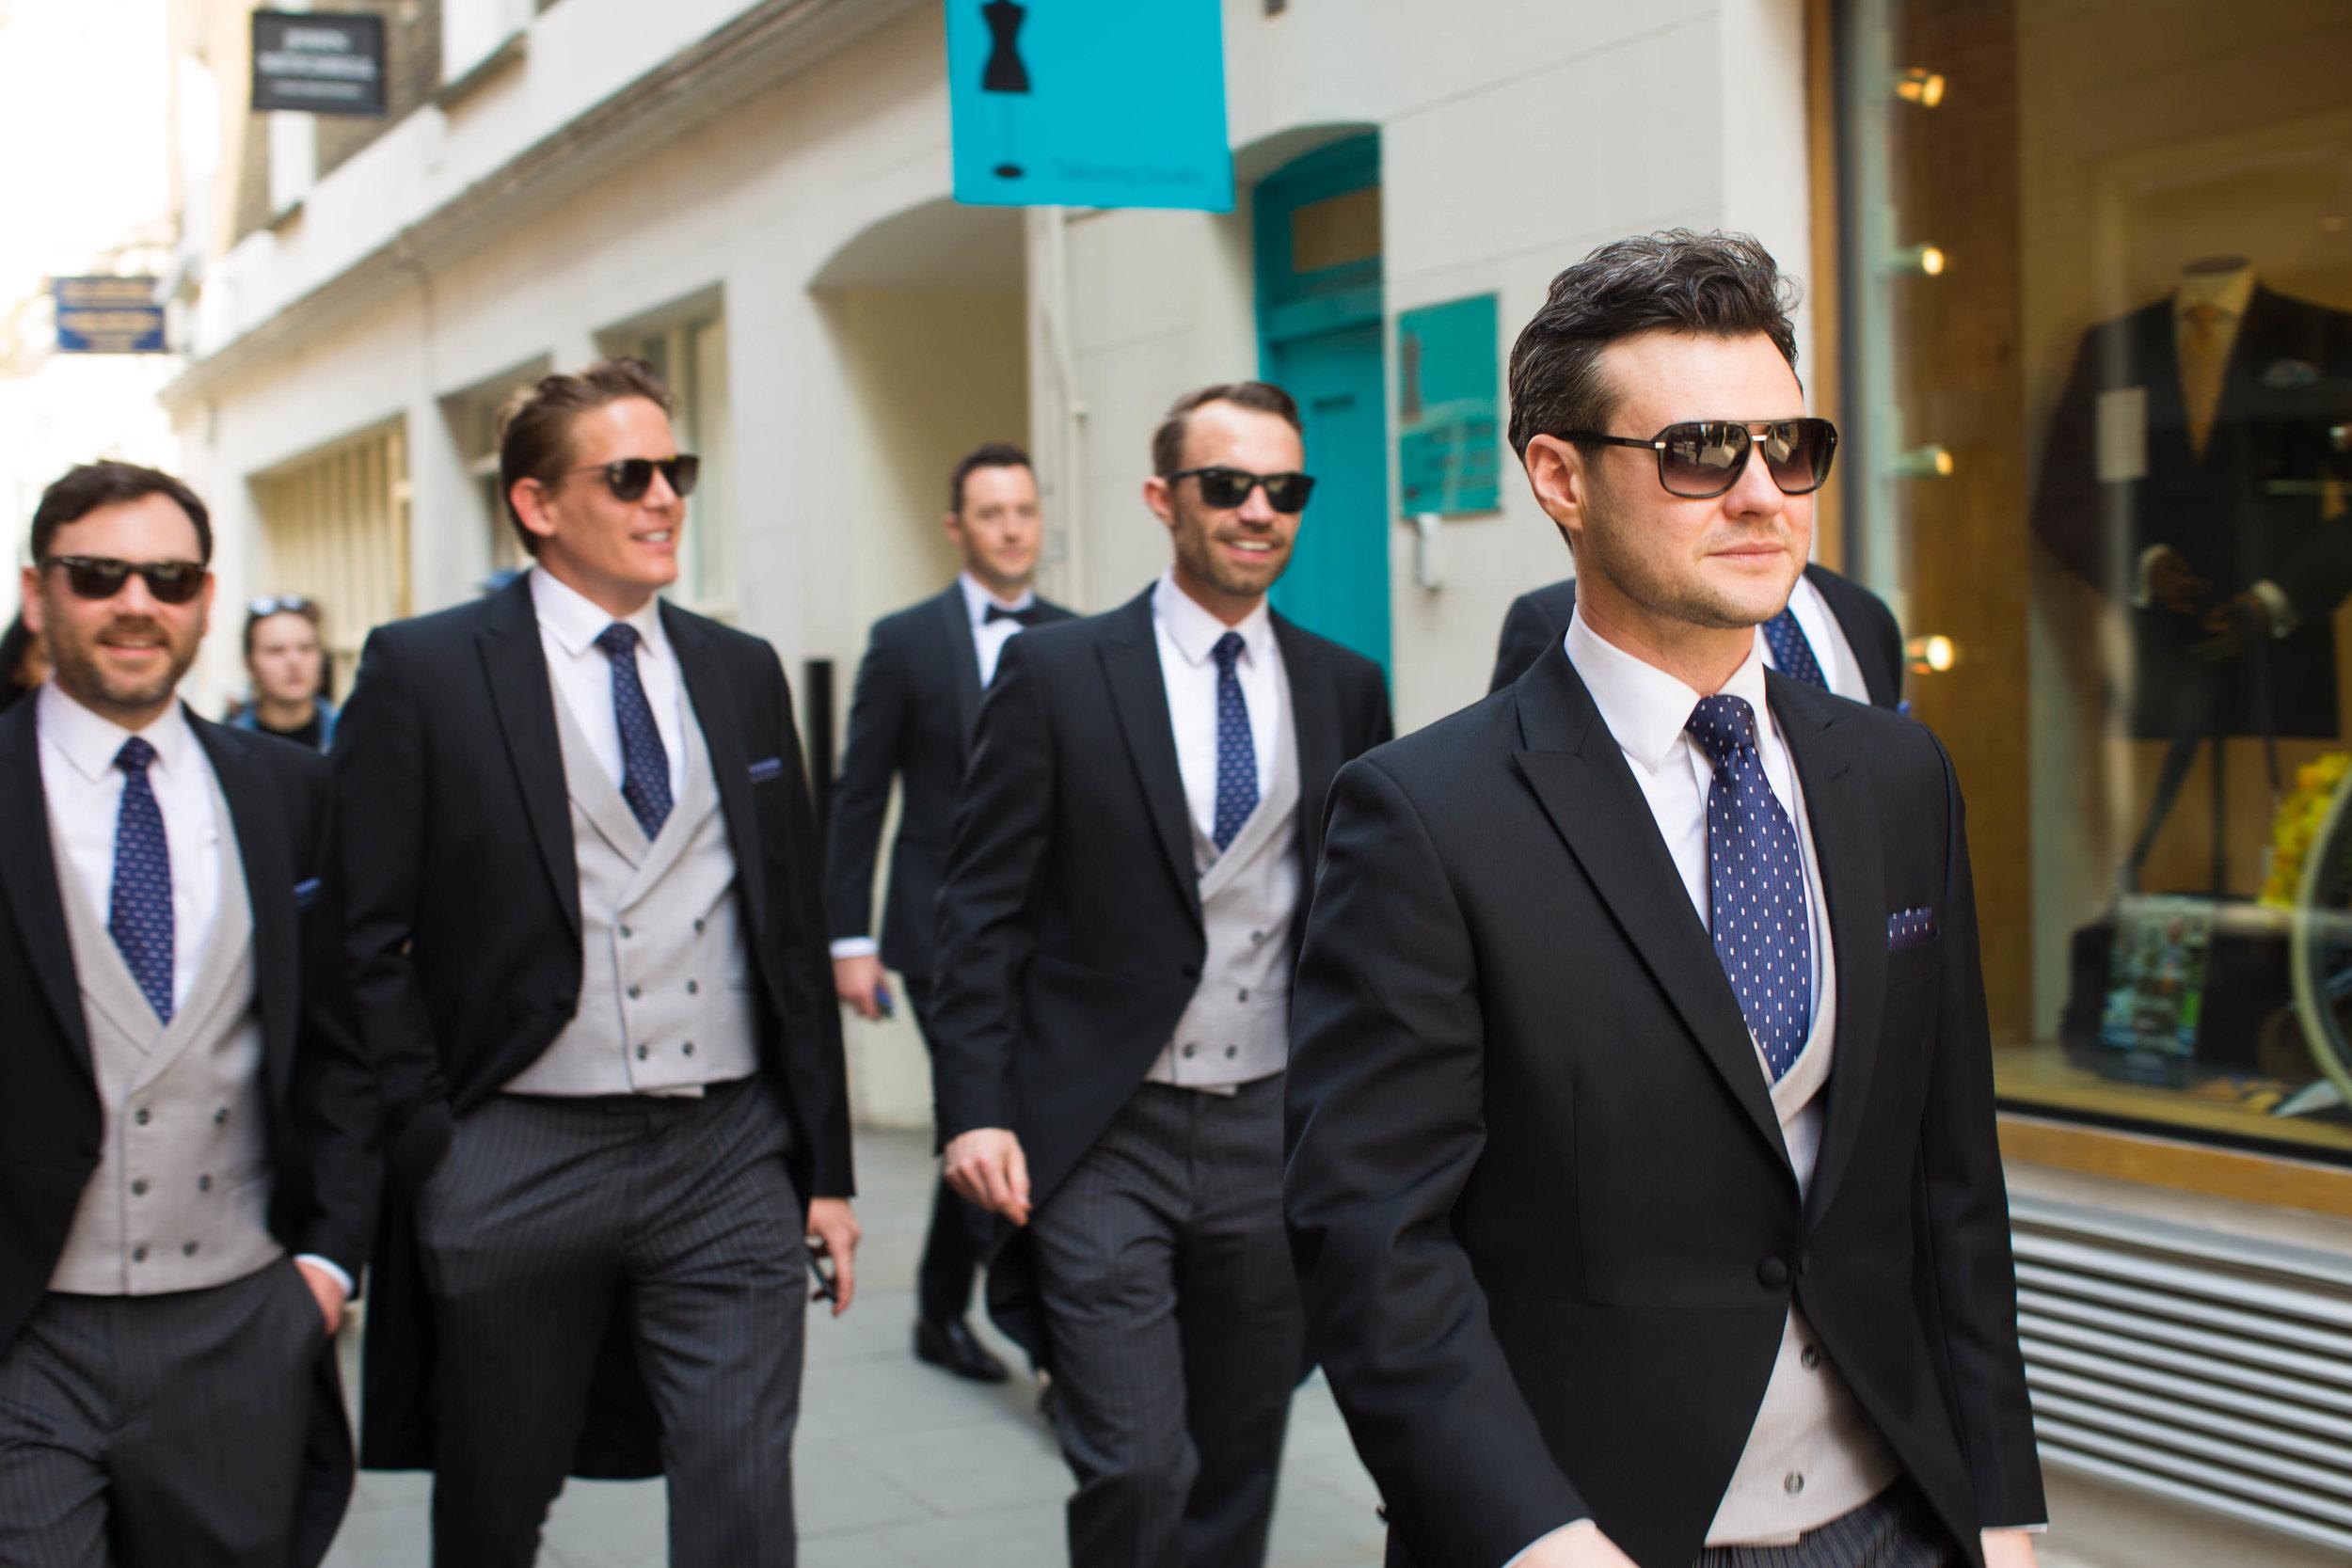 claridges-hotel-wedding-photographer-london-mayfair-natalia-smith-photography-37.jpg